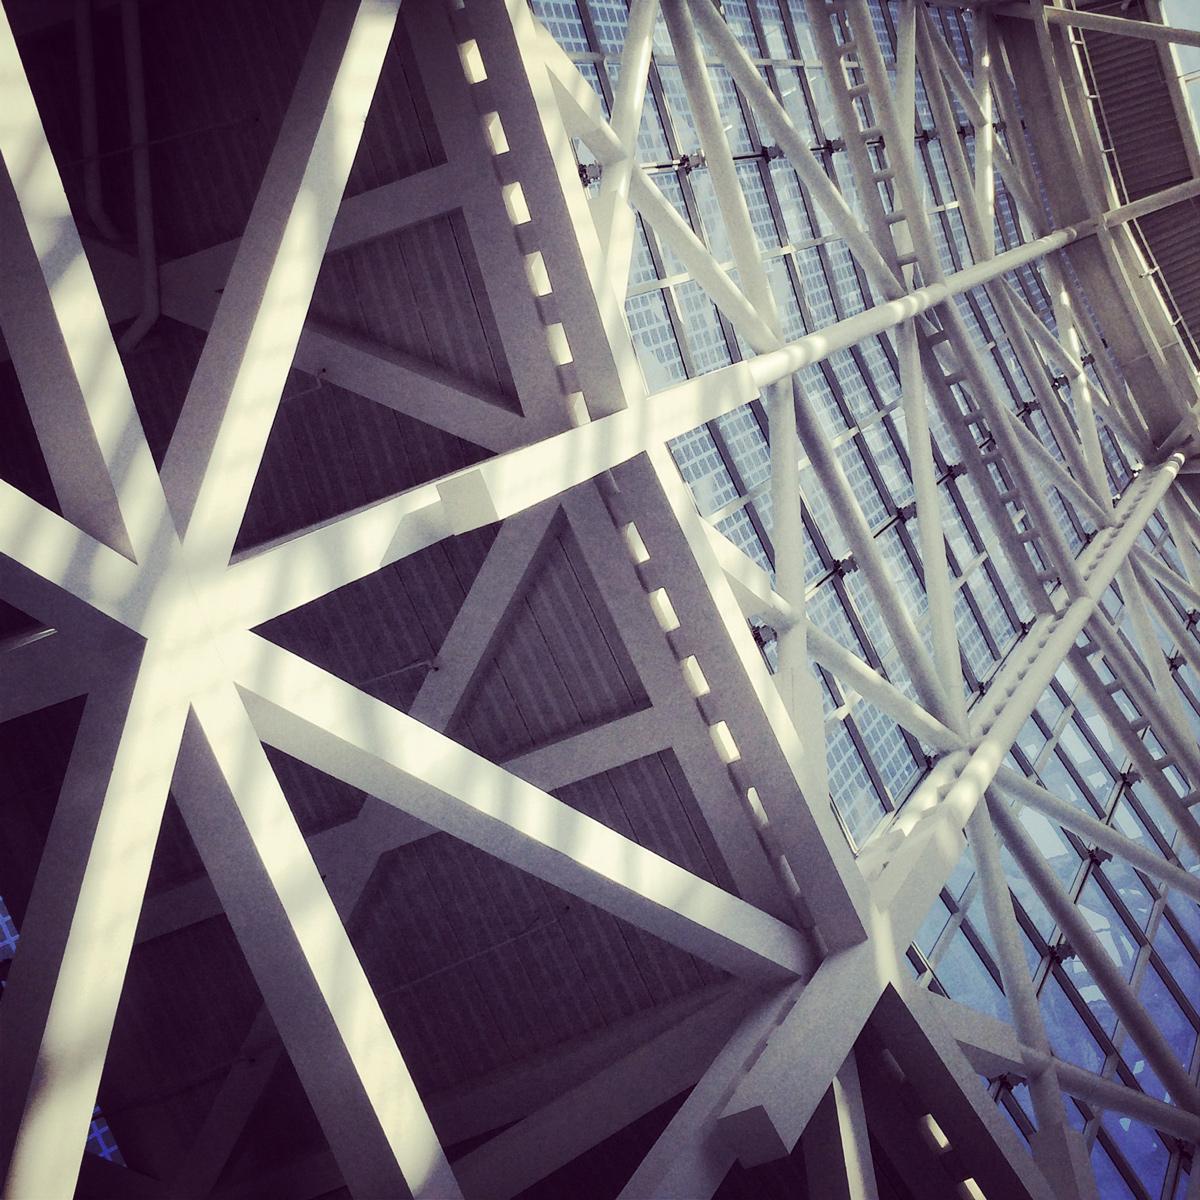 dwell on design  / la convention center